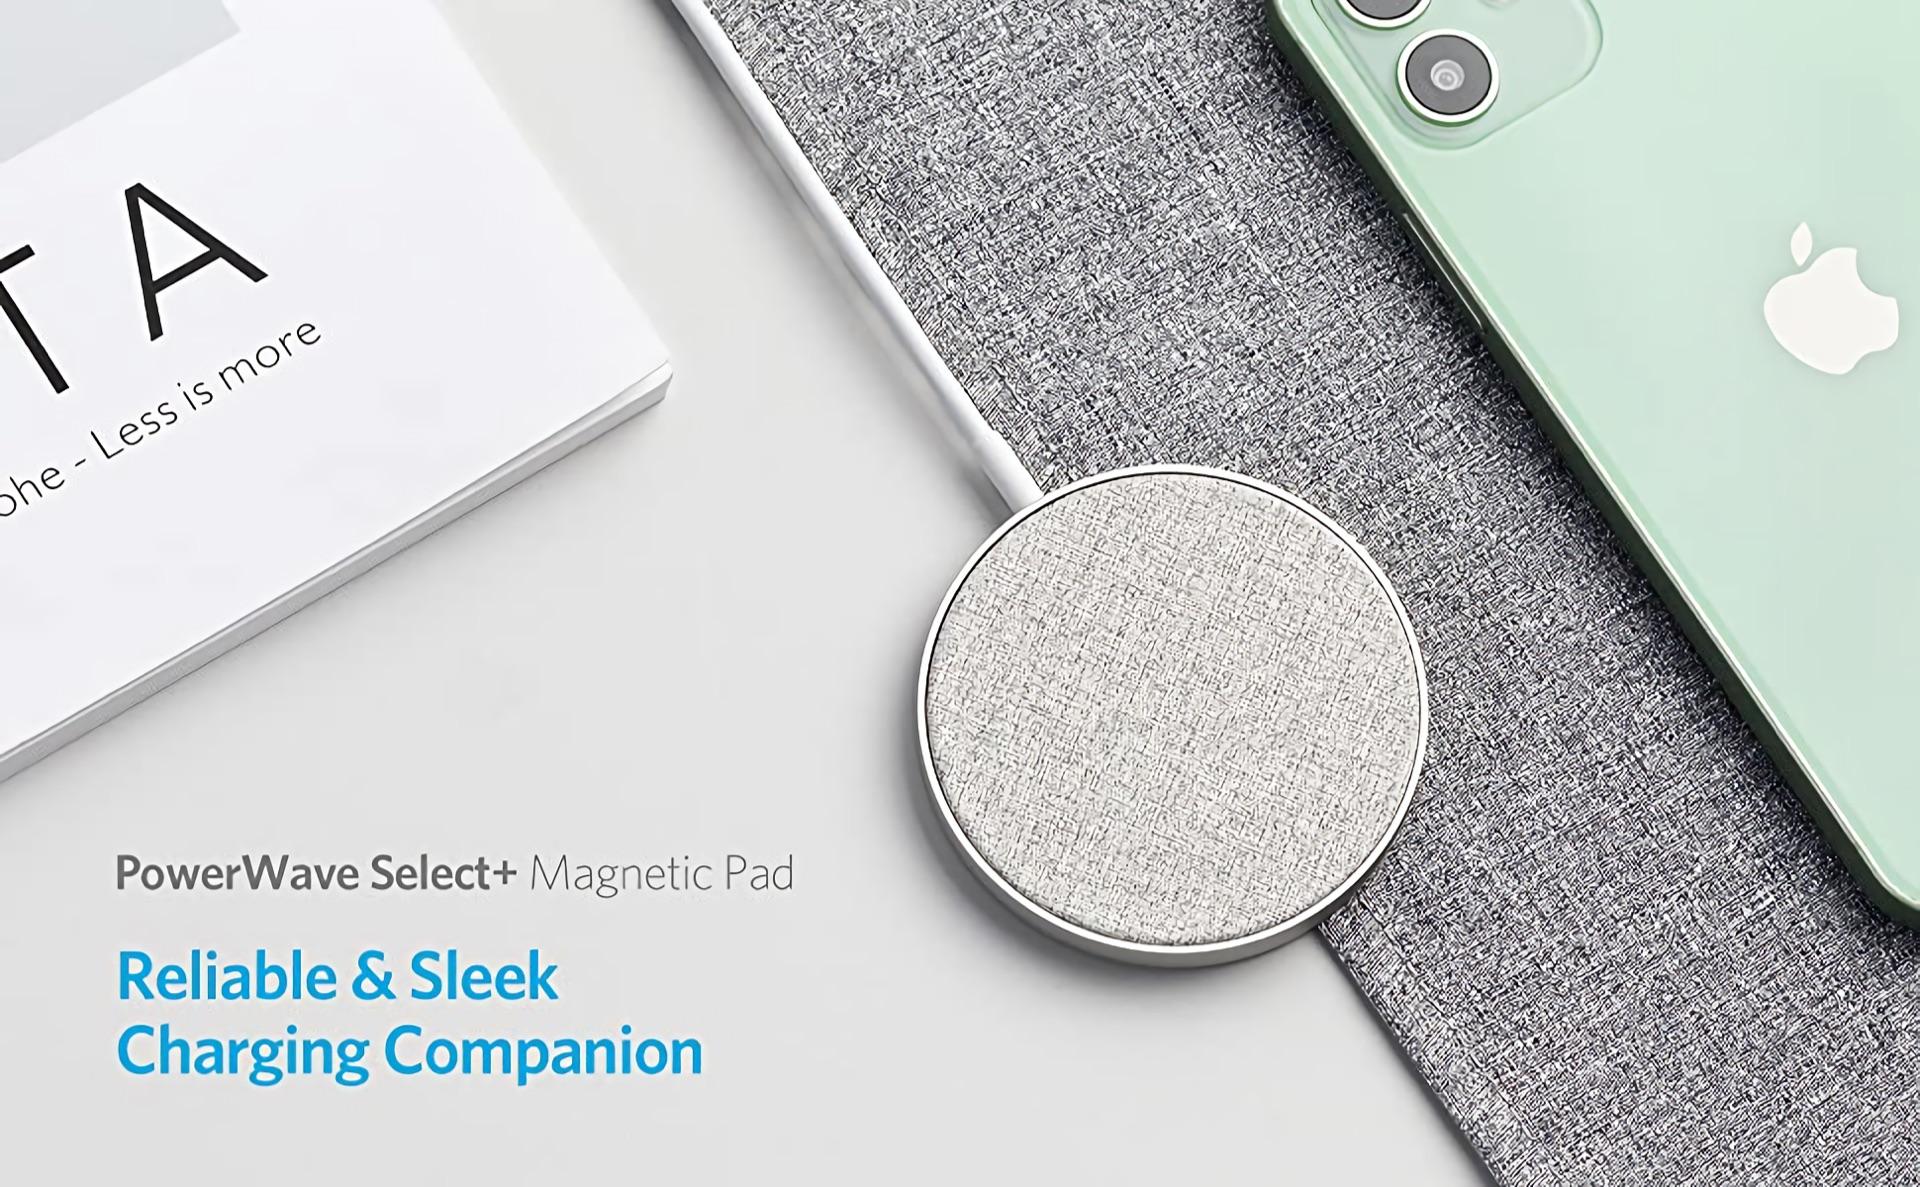 Anker PowerWave Select plus Magnetic Pad